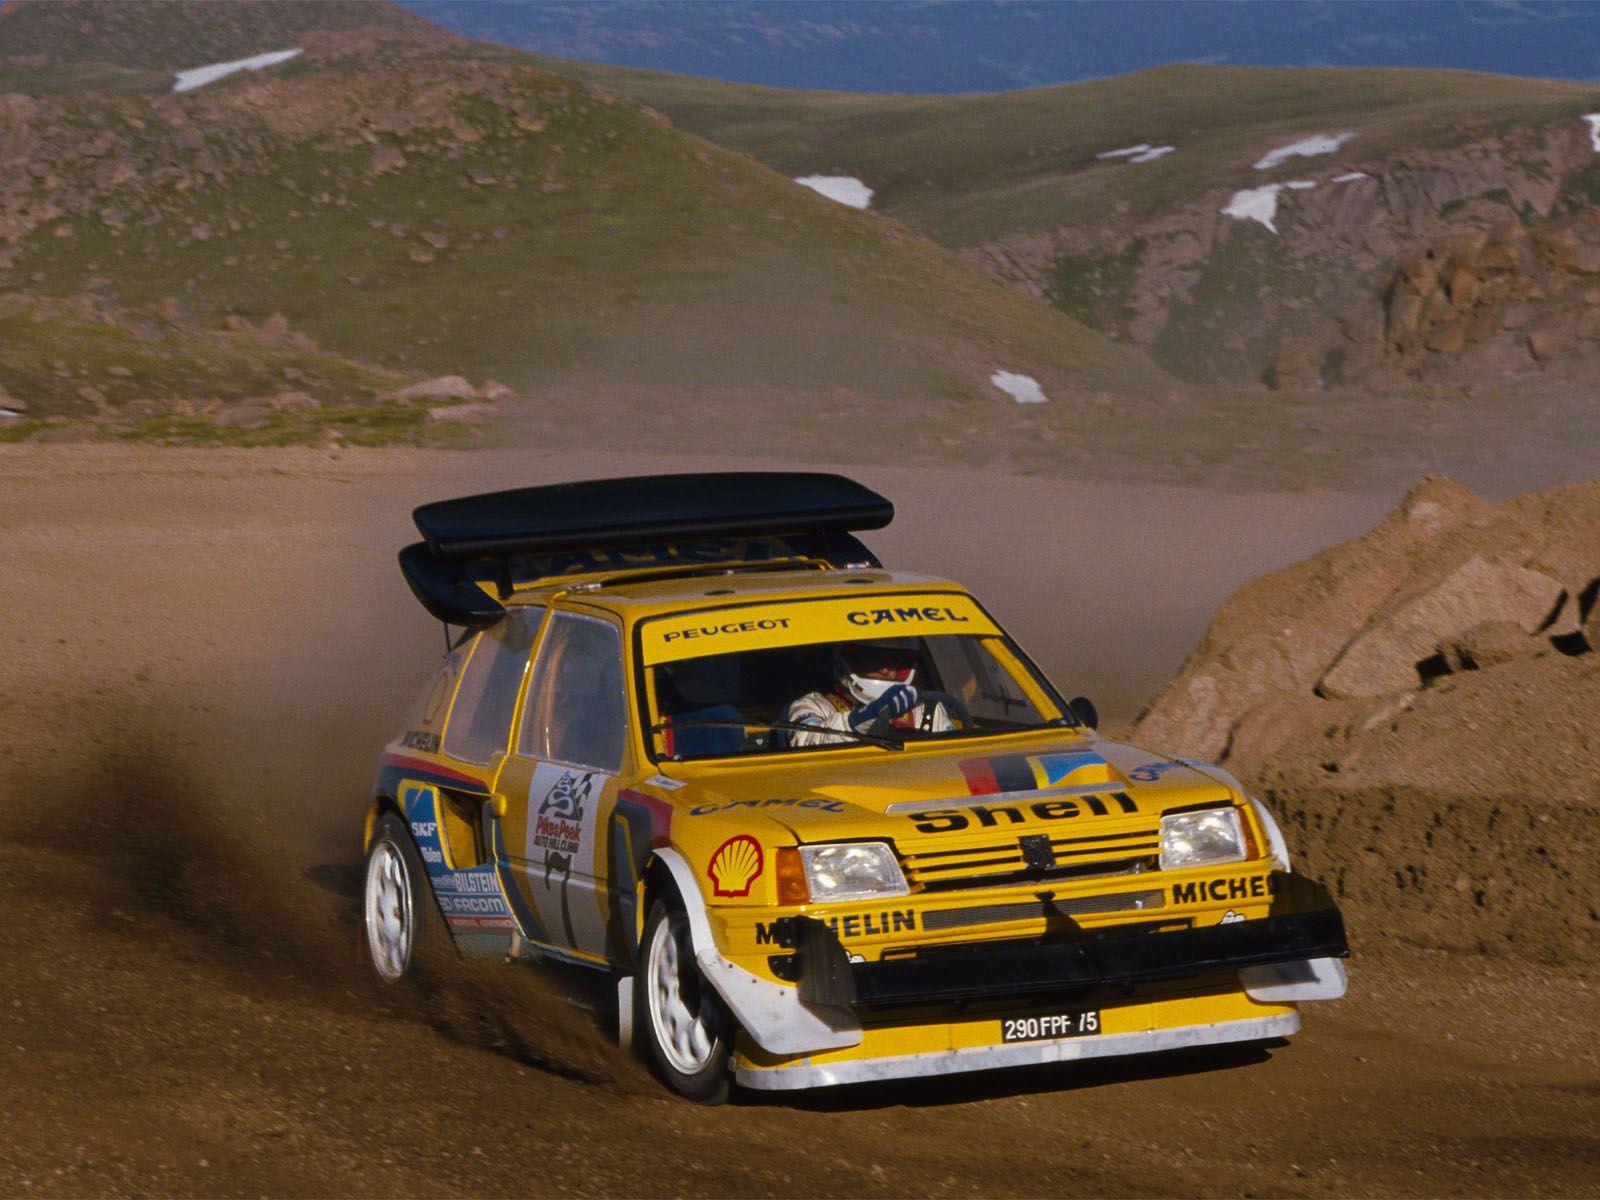 1985 Peugeot 205 Turbo 16 Rally  cars  Pinterest  Peugeot